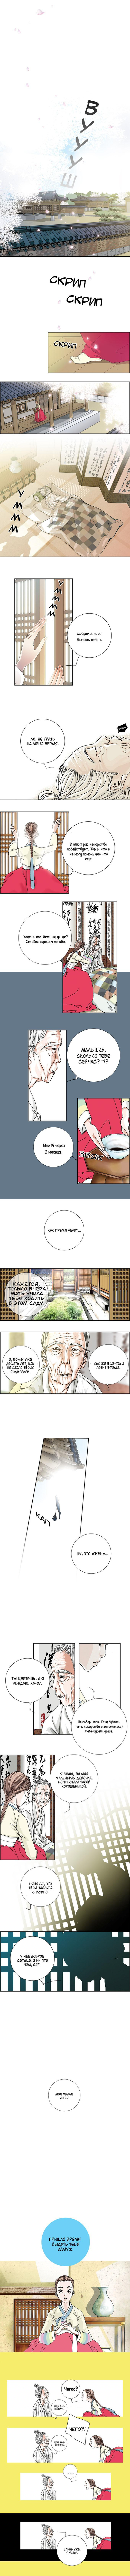 https://r1.ninemanga.com/comics/pic2/29/28573/285667/1456629016430.jpg Page 1